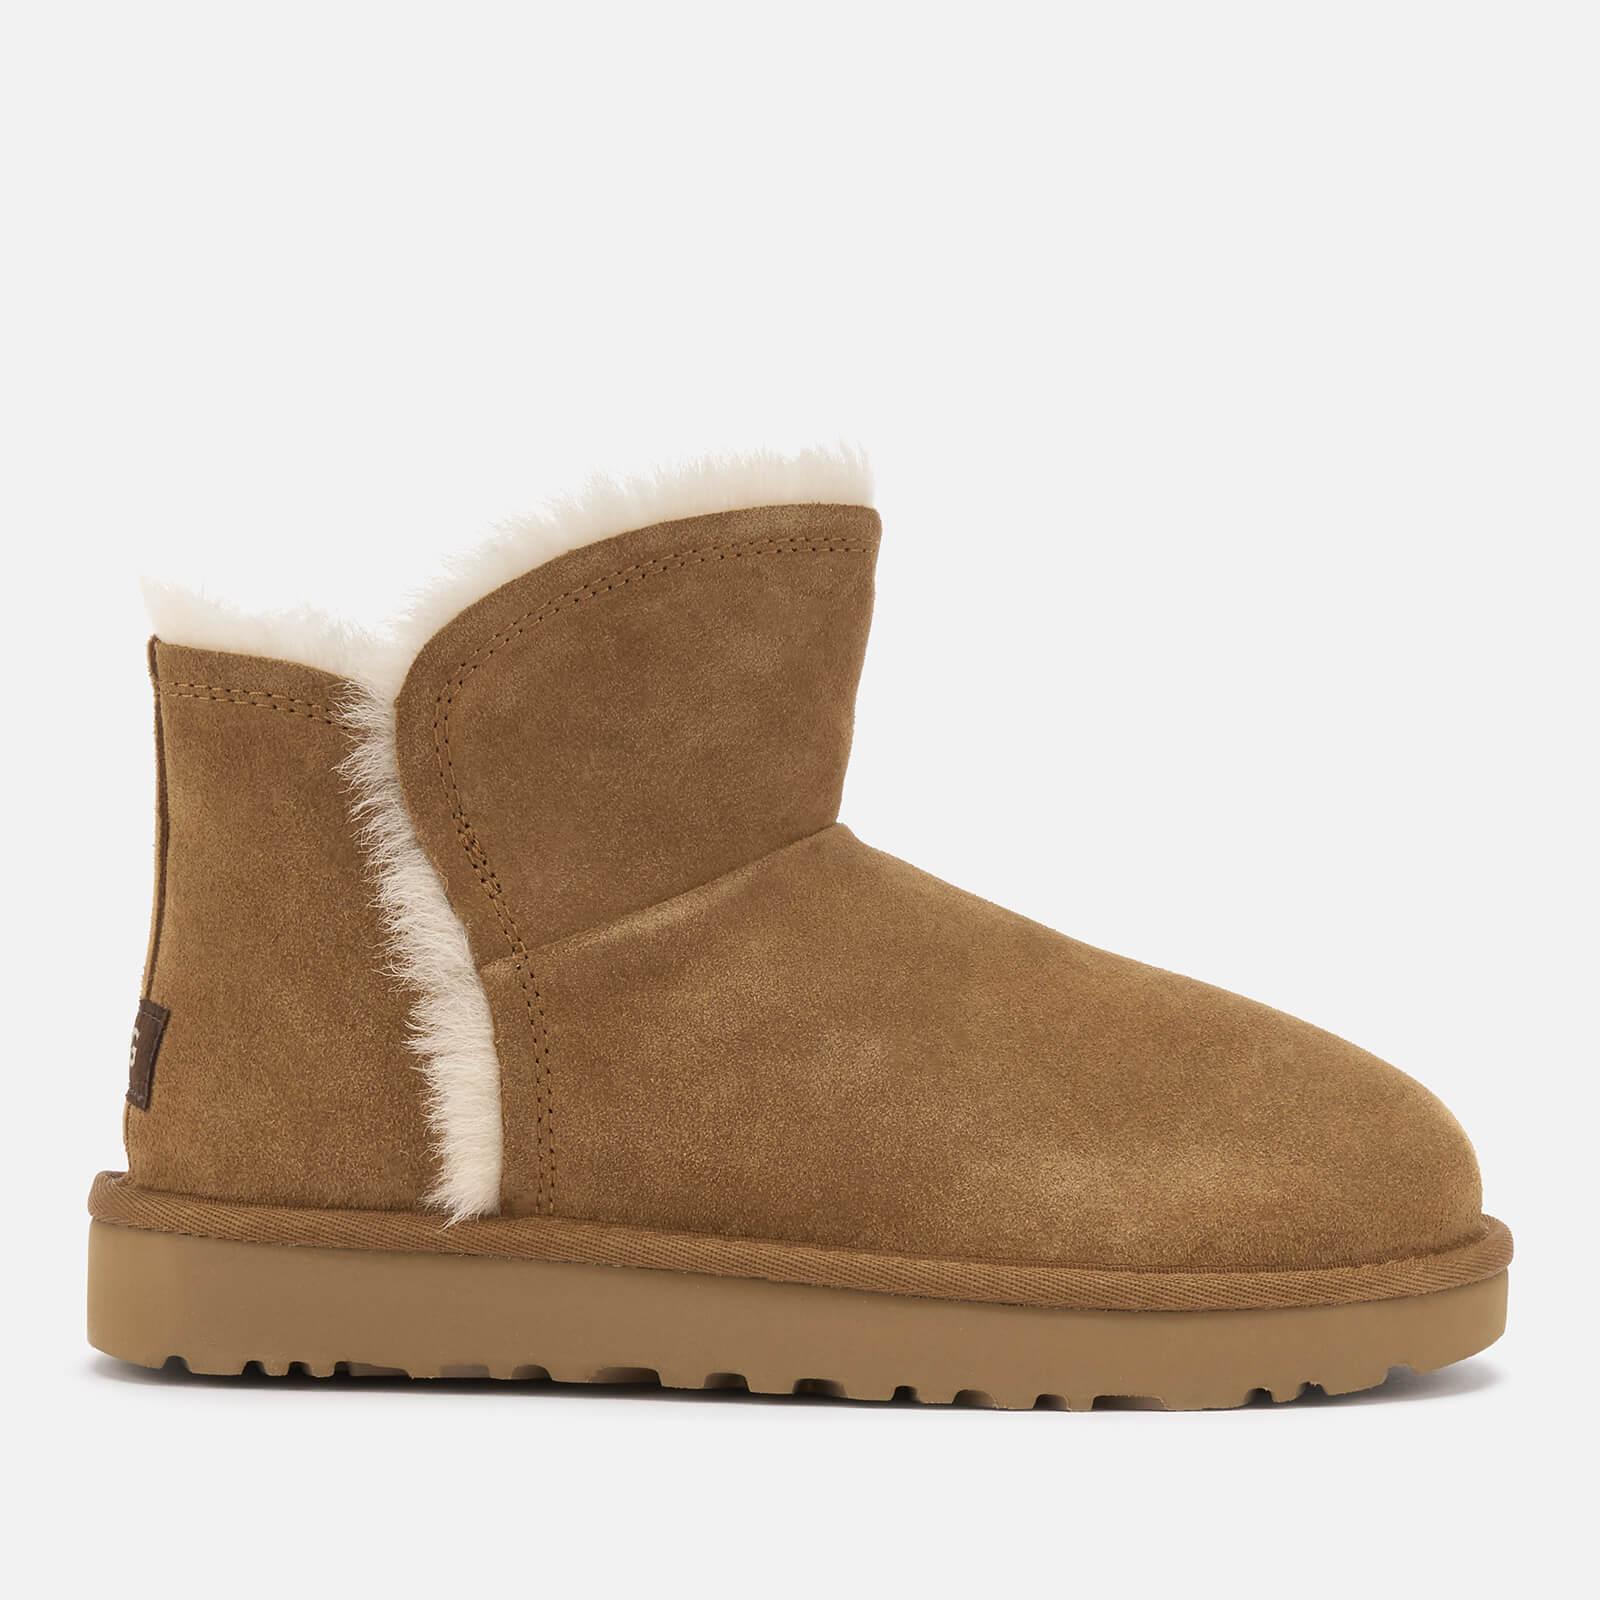 UGG Women's Classic Mini Fluff Trim Sheepskin Boots - Chestnut - UK 7